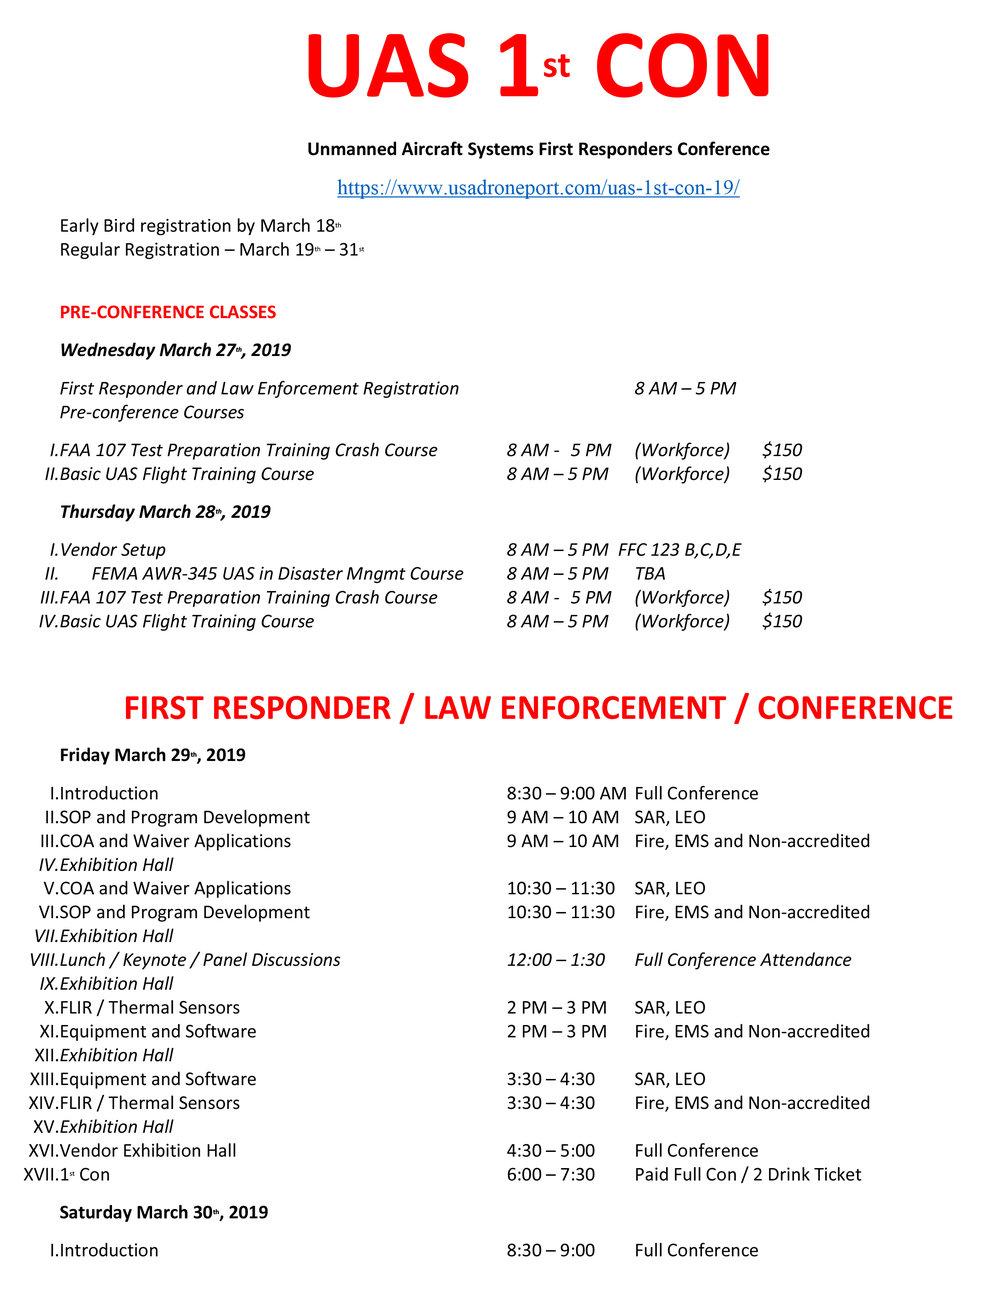 UAS 1st CON Agenda Page 1.jpg